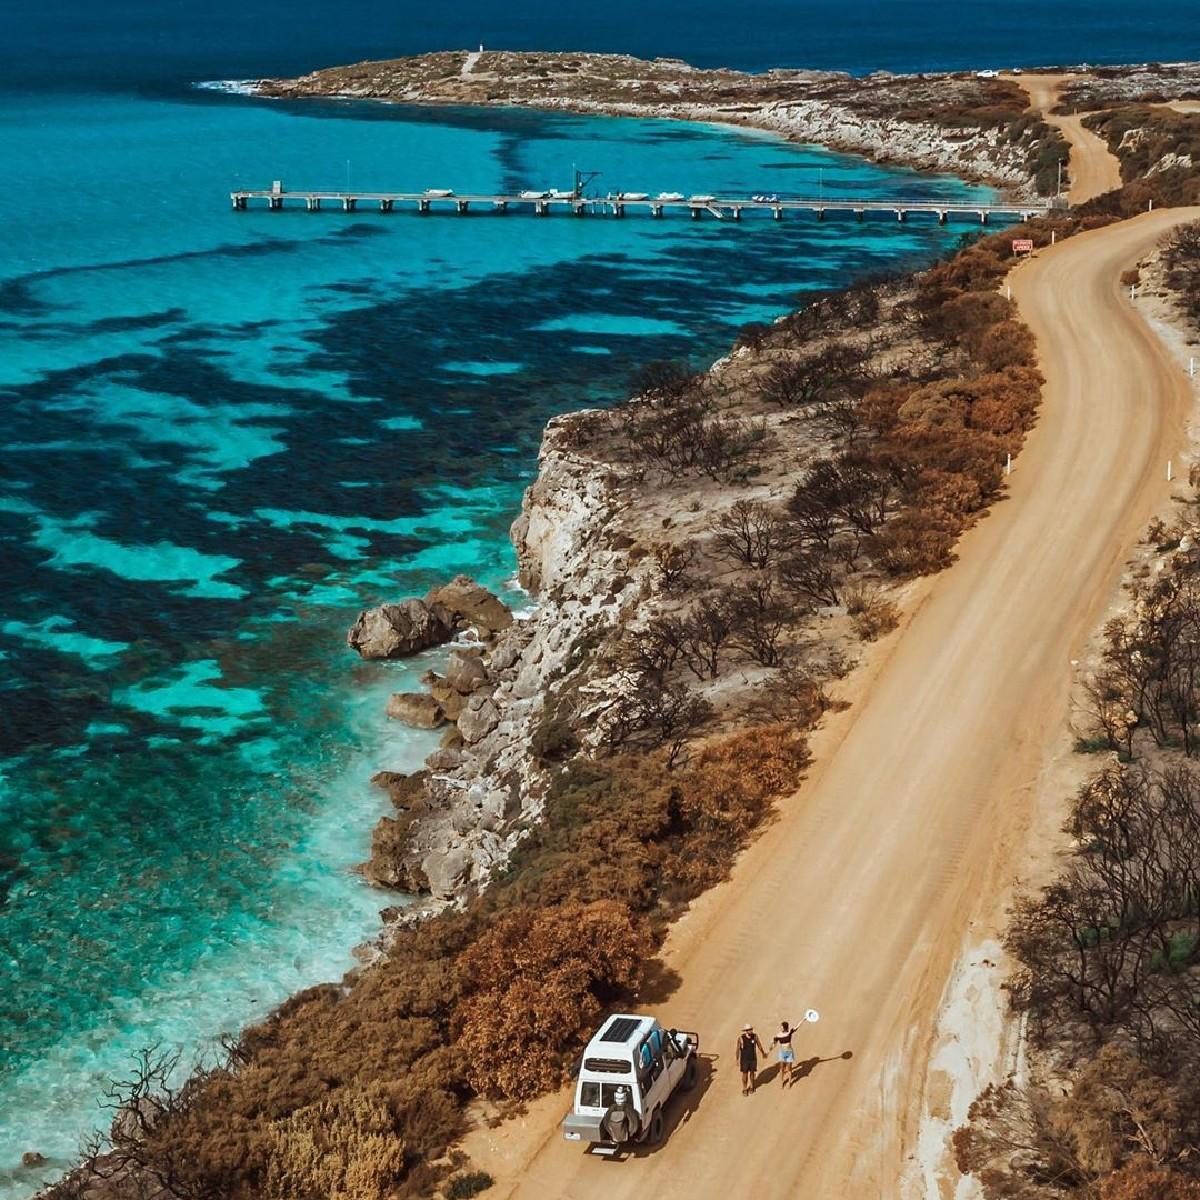 #travel Australia: Yep, the water surrounding #KangarooIsland really is this blue! 💙   IG/_aswewander captured the striking electric blue ocean of #VivonneBay during a #roadtrip around #KangarooIsland, just a 45-minute @SealinkKIferry ride from main… https://t.co/9Evg4qHlw3